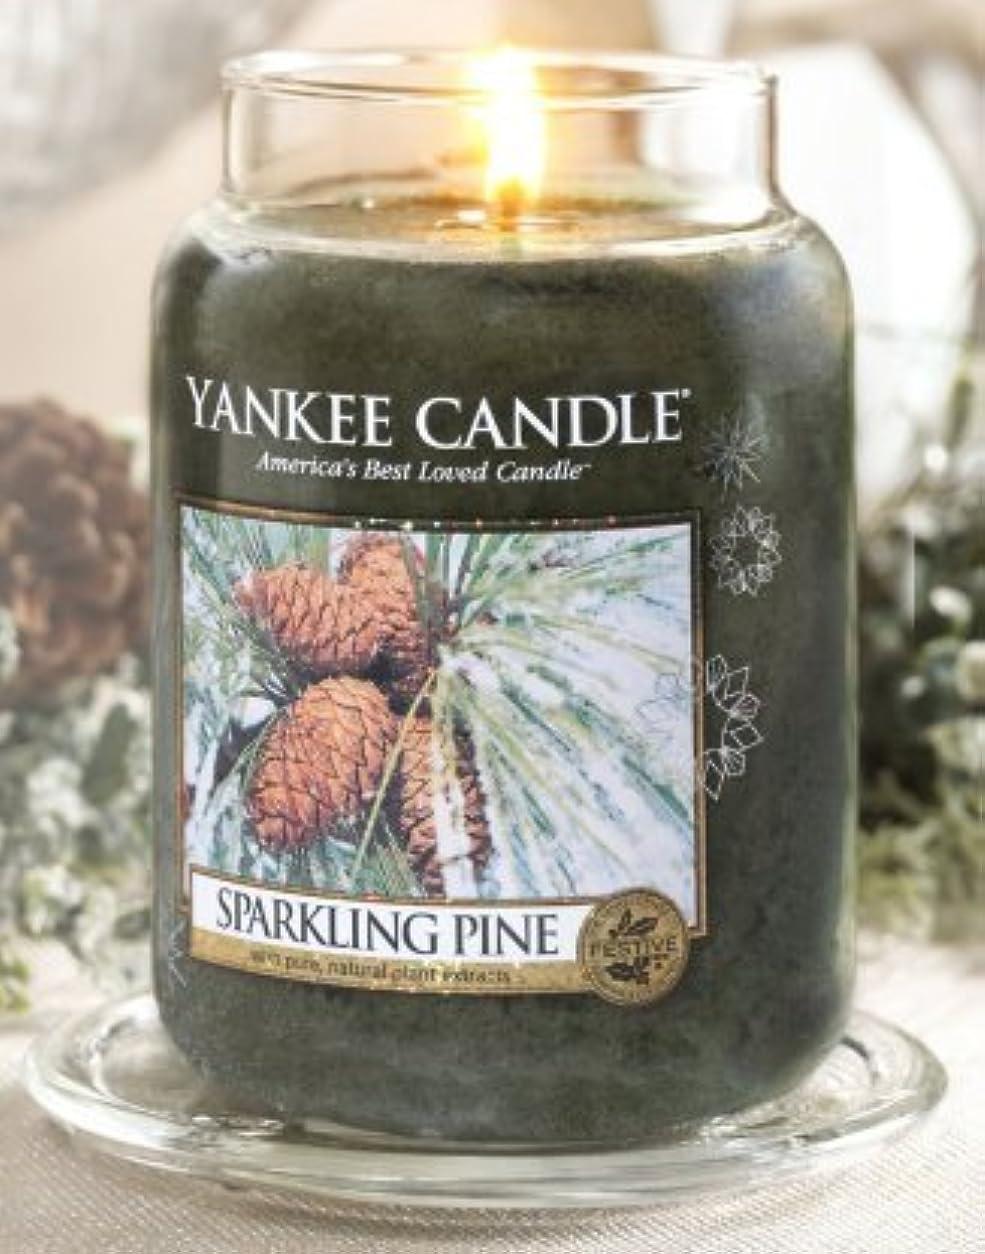 Yankee Candle Sparkling Pine Large Jar Candle